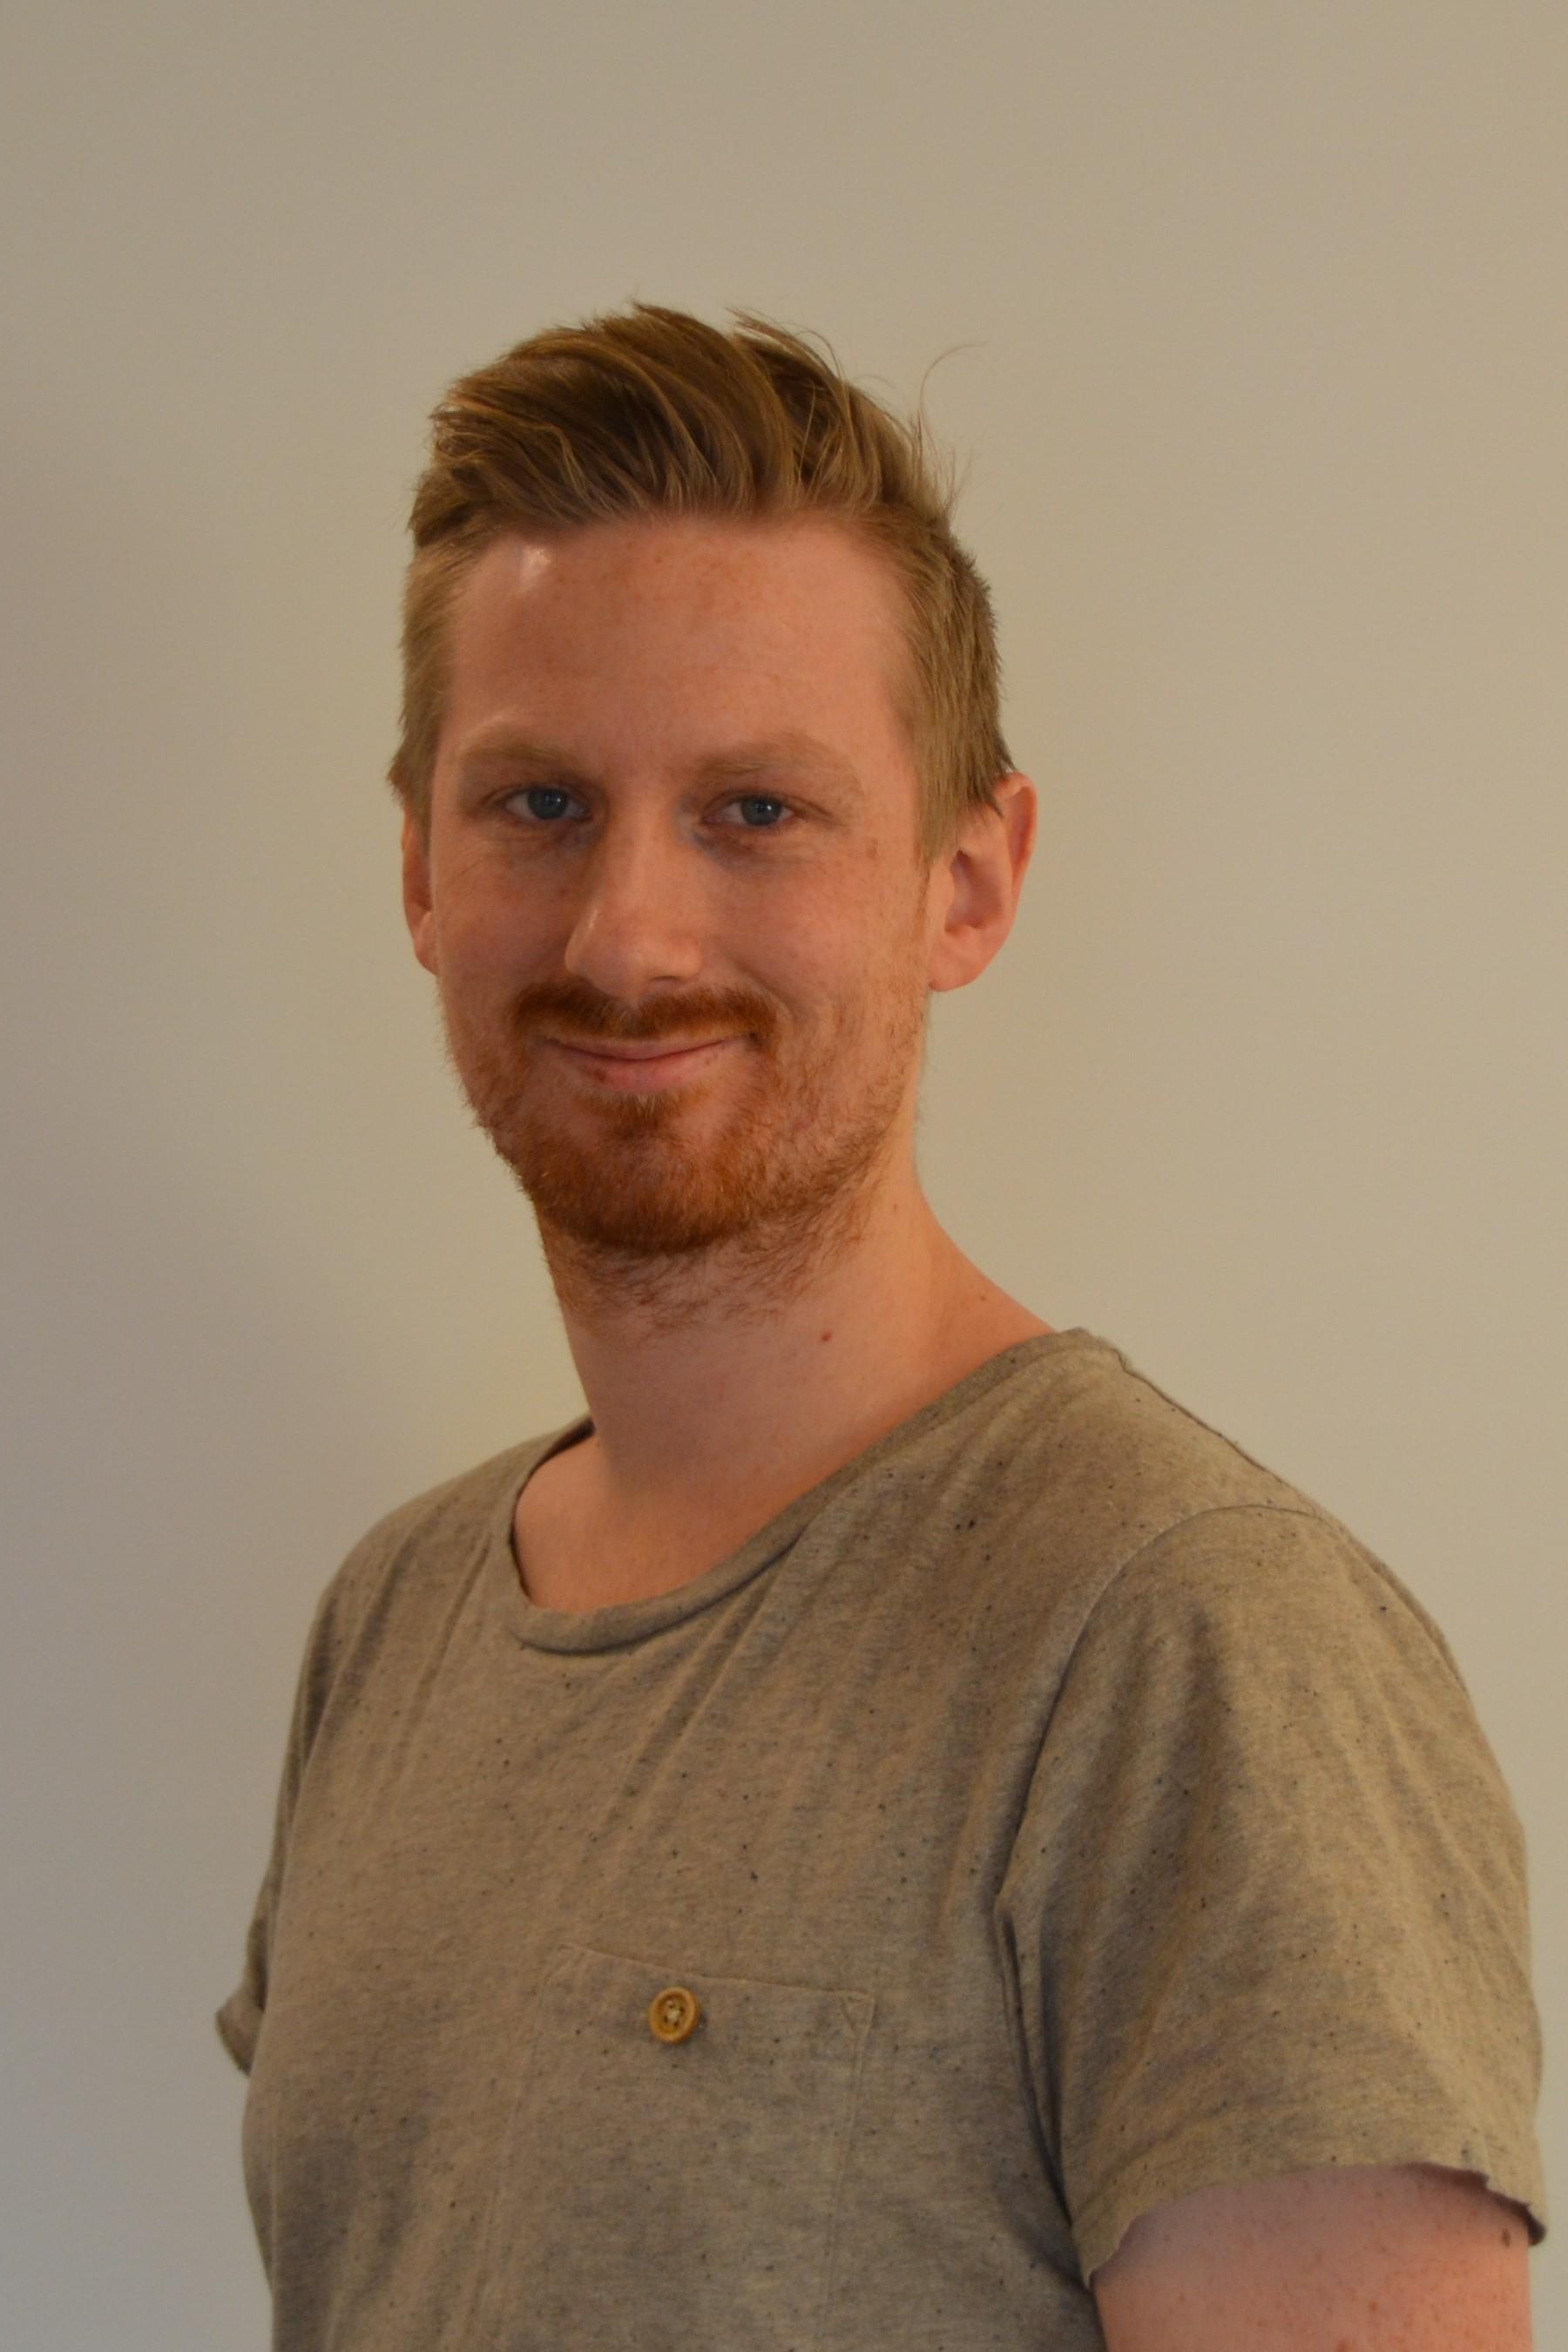 Magnus Johansen Fredriksli